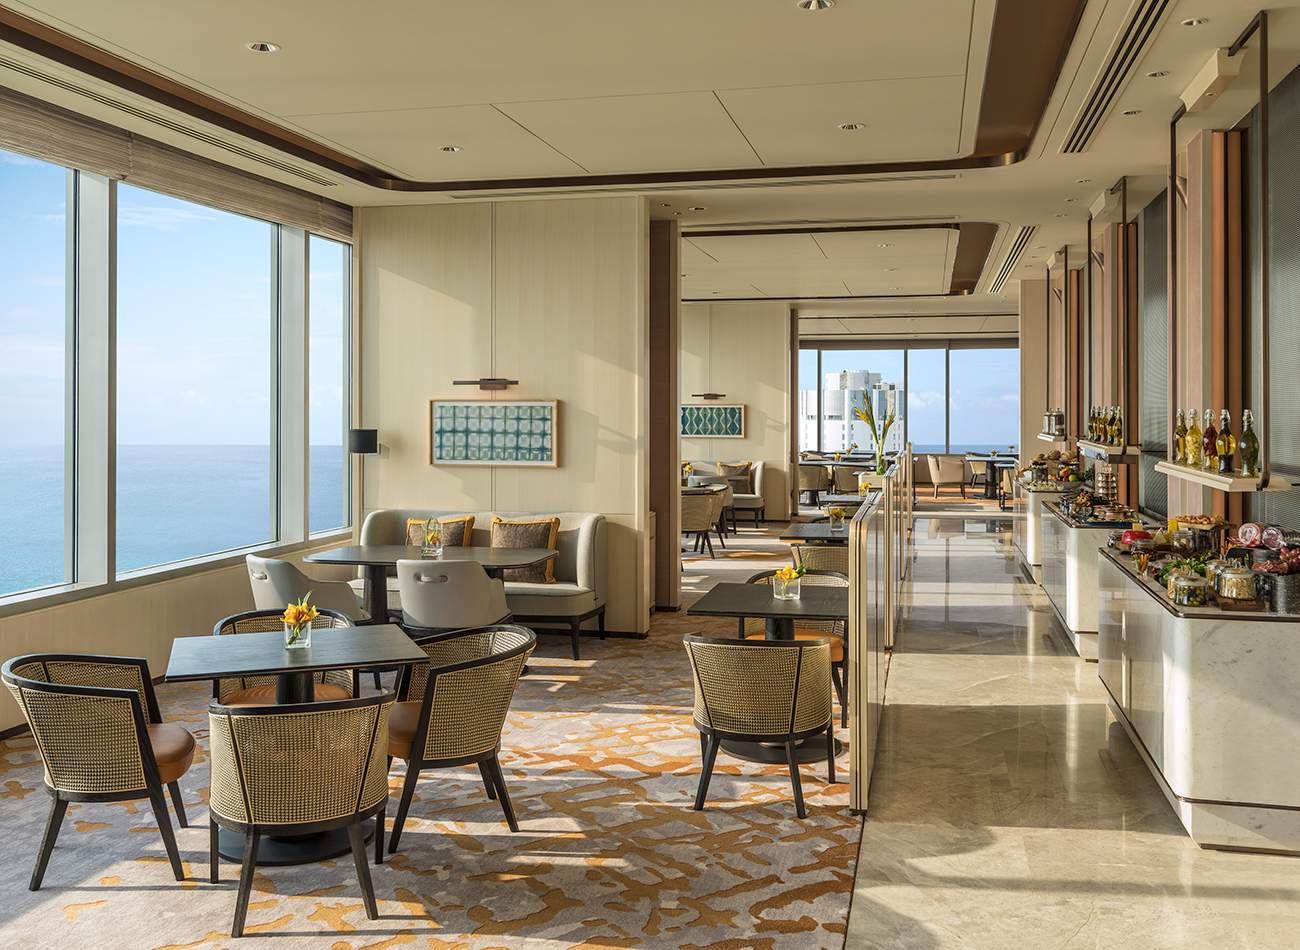 Shangri%20La%20Hotel%20Colombo%20Horizon%20Club%20Lounge.jpg